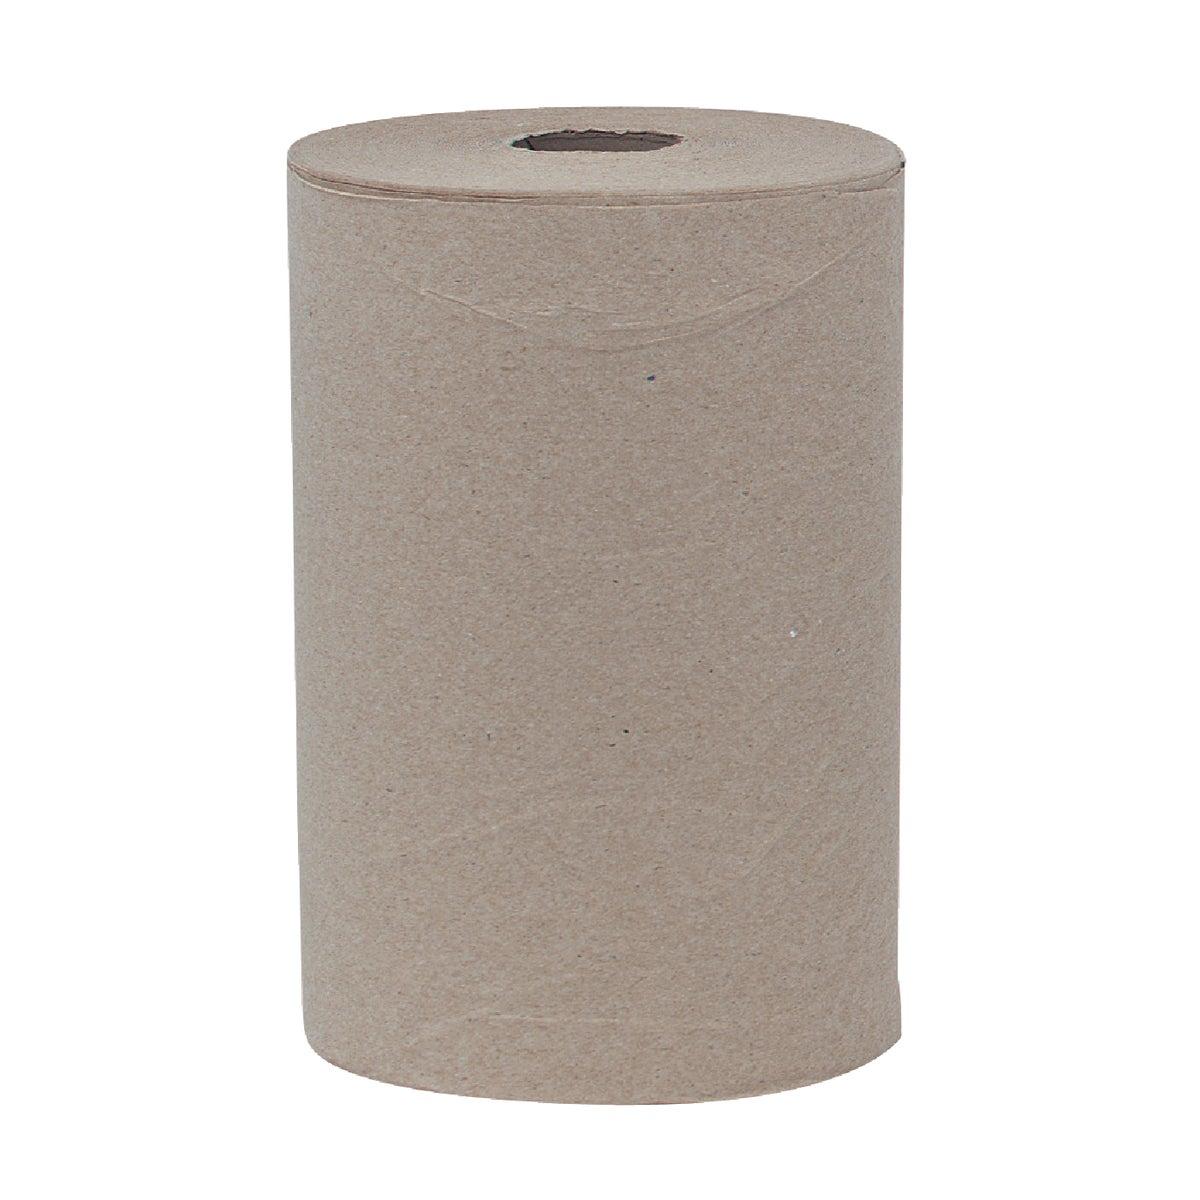 Hard Roll Paper Towels